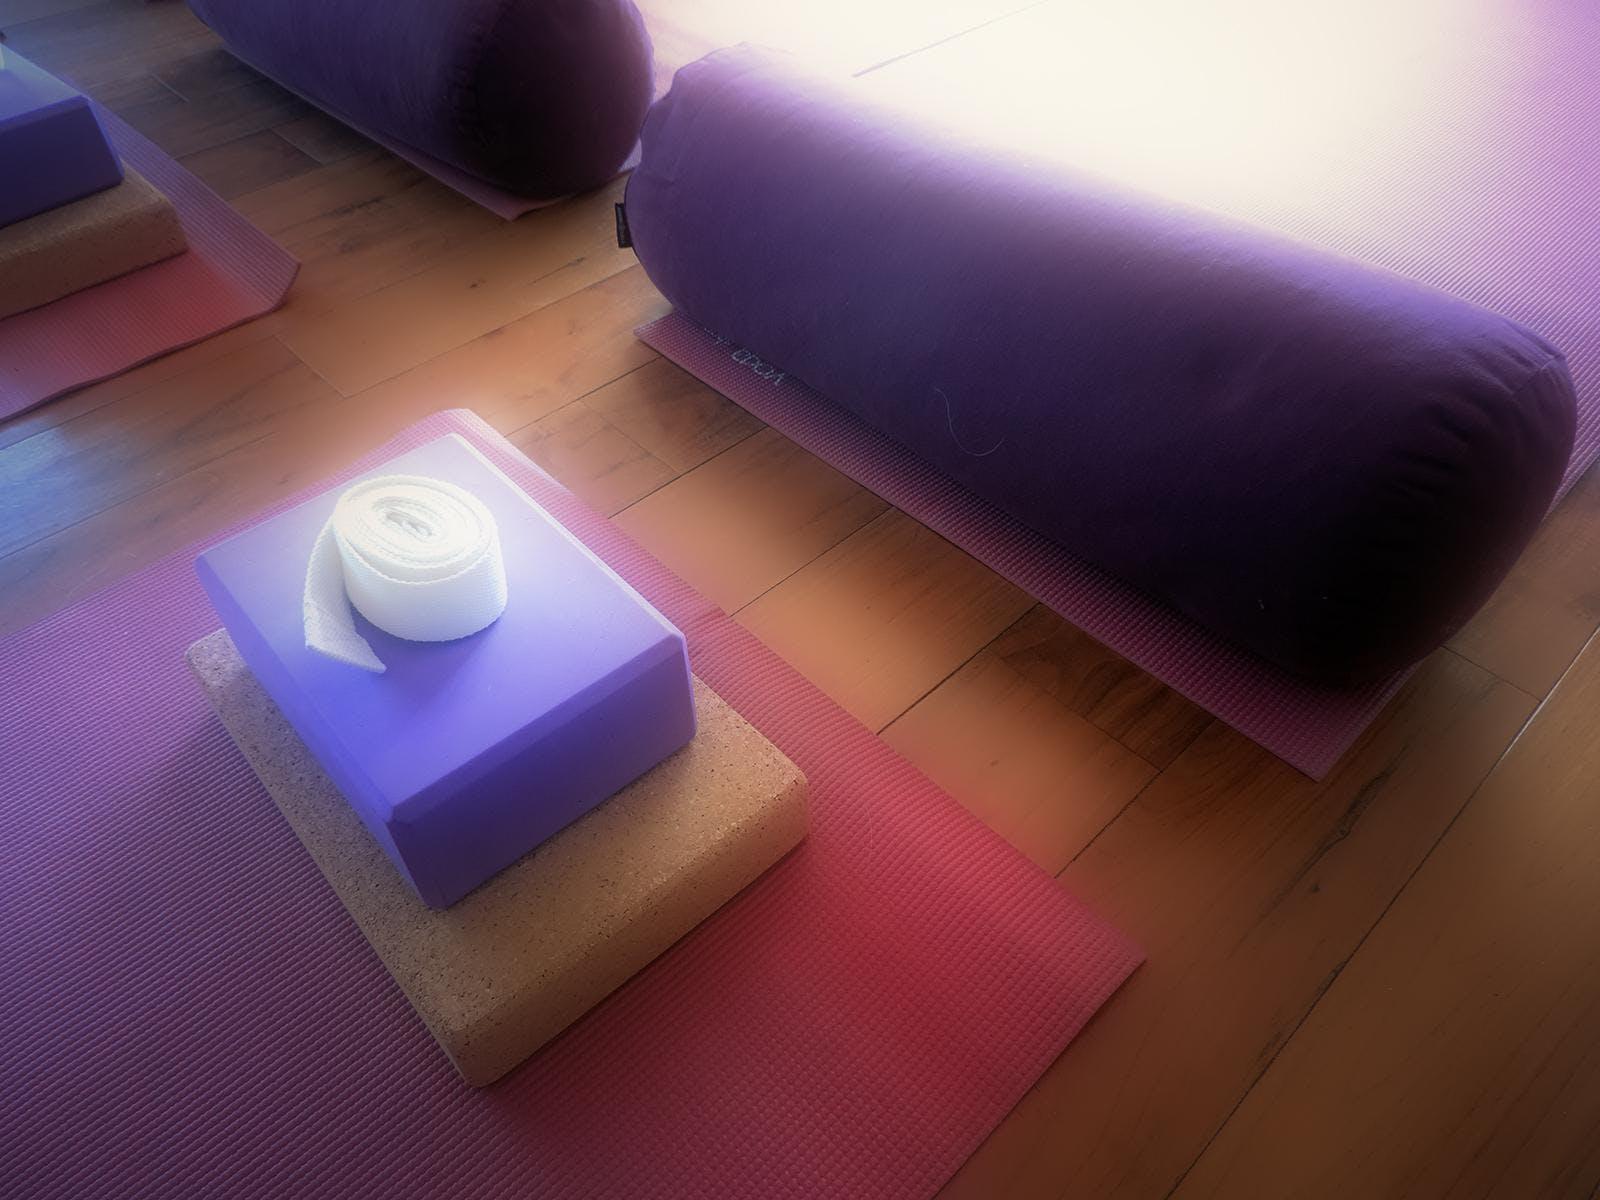 Yoga for Beginners: Week 1 - 19:00 - 20:30